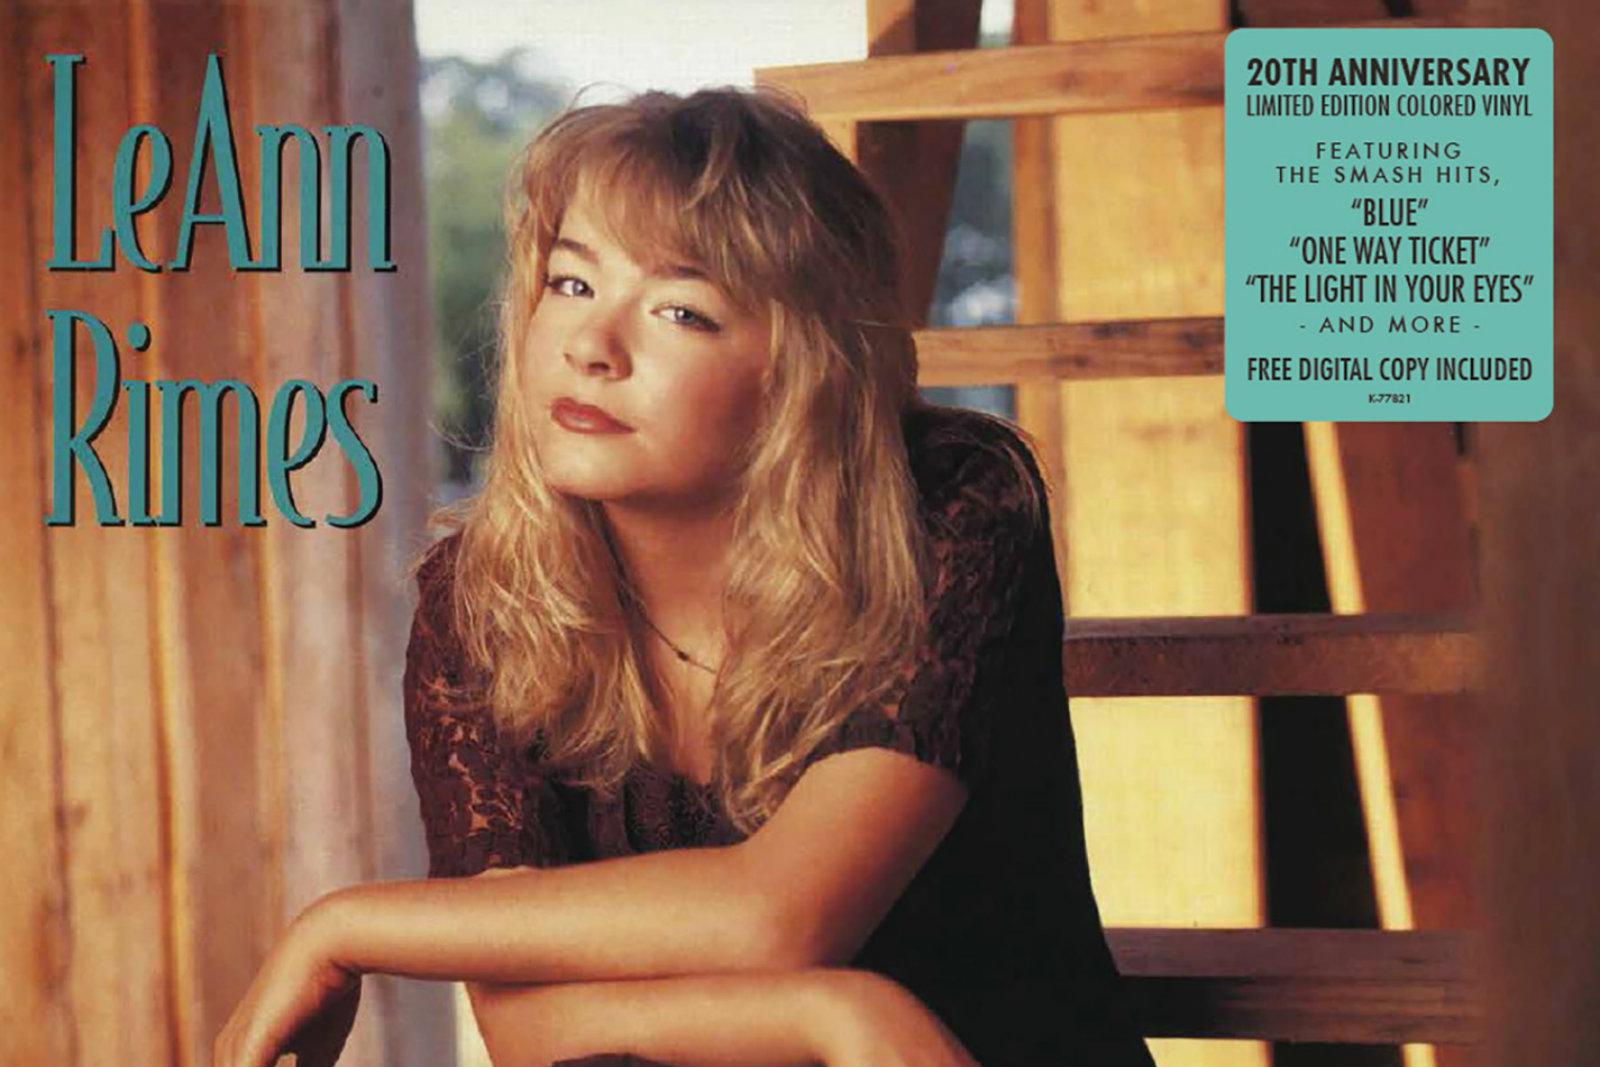 Throwback Thursday: LeAnn Rimes, debut album Blue